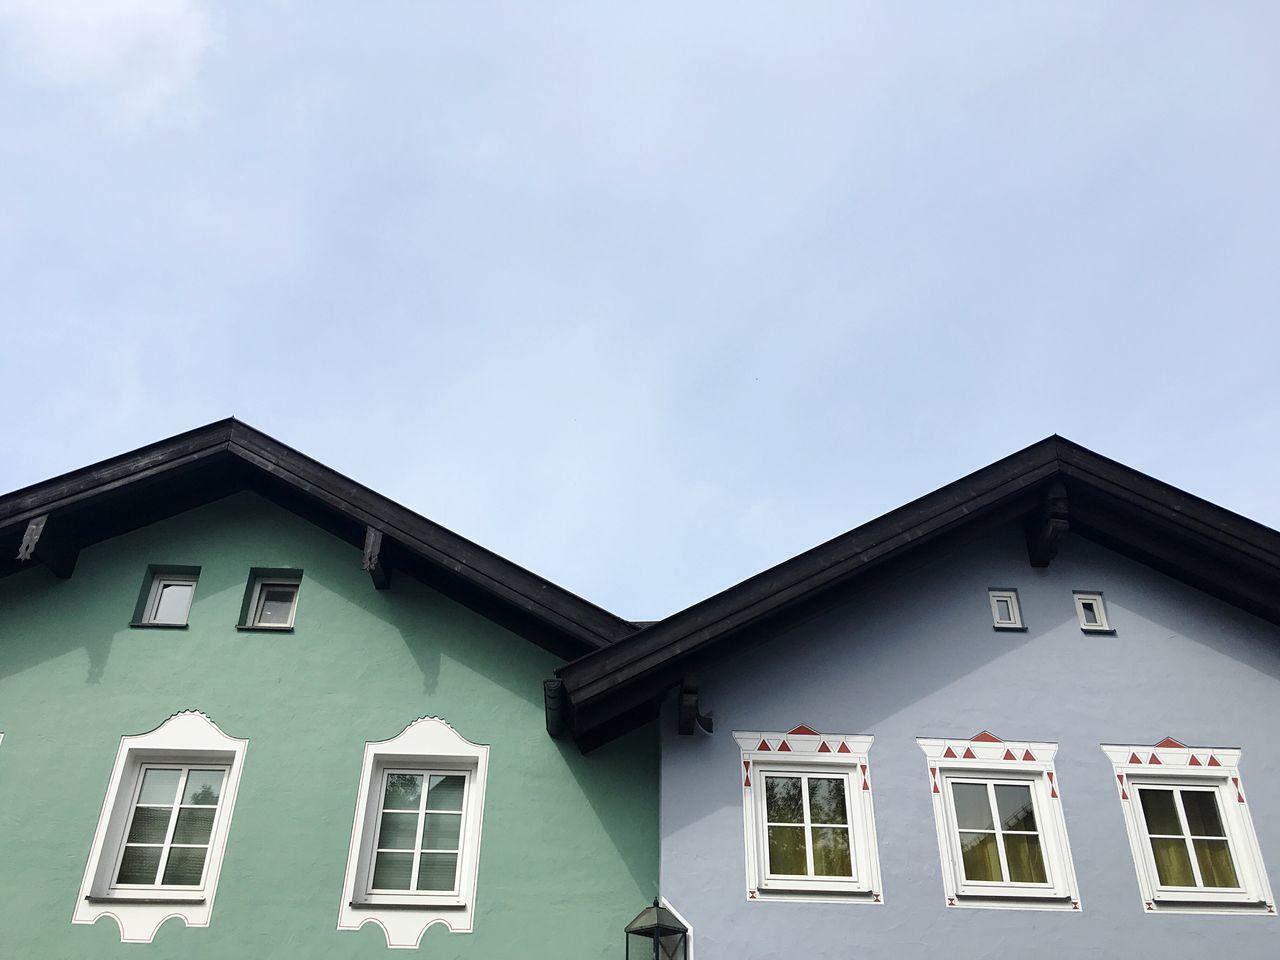 Bad Tölz Bavaria Bavarian Houses Bavarian Architecture Built Structure Coloured Houses